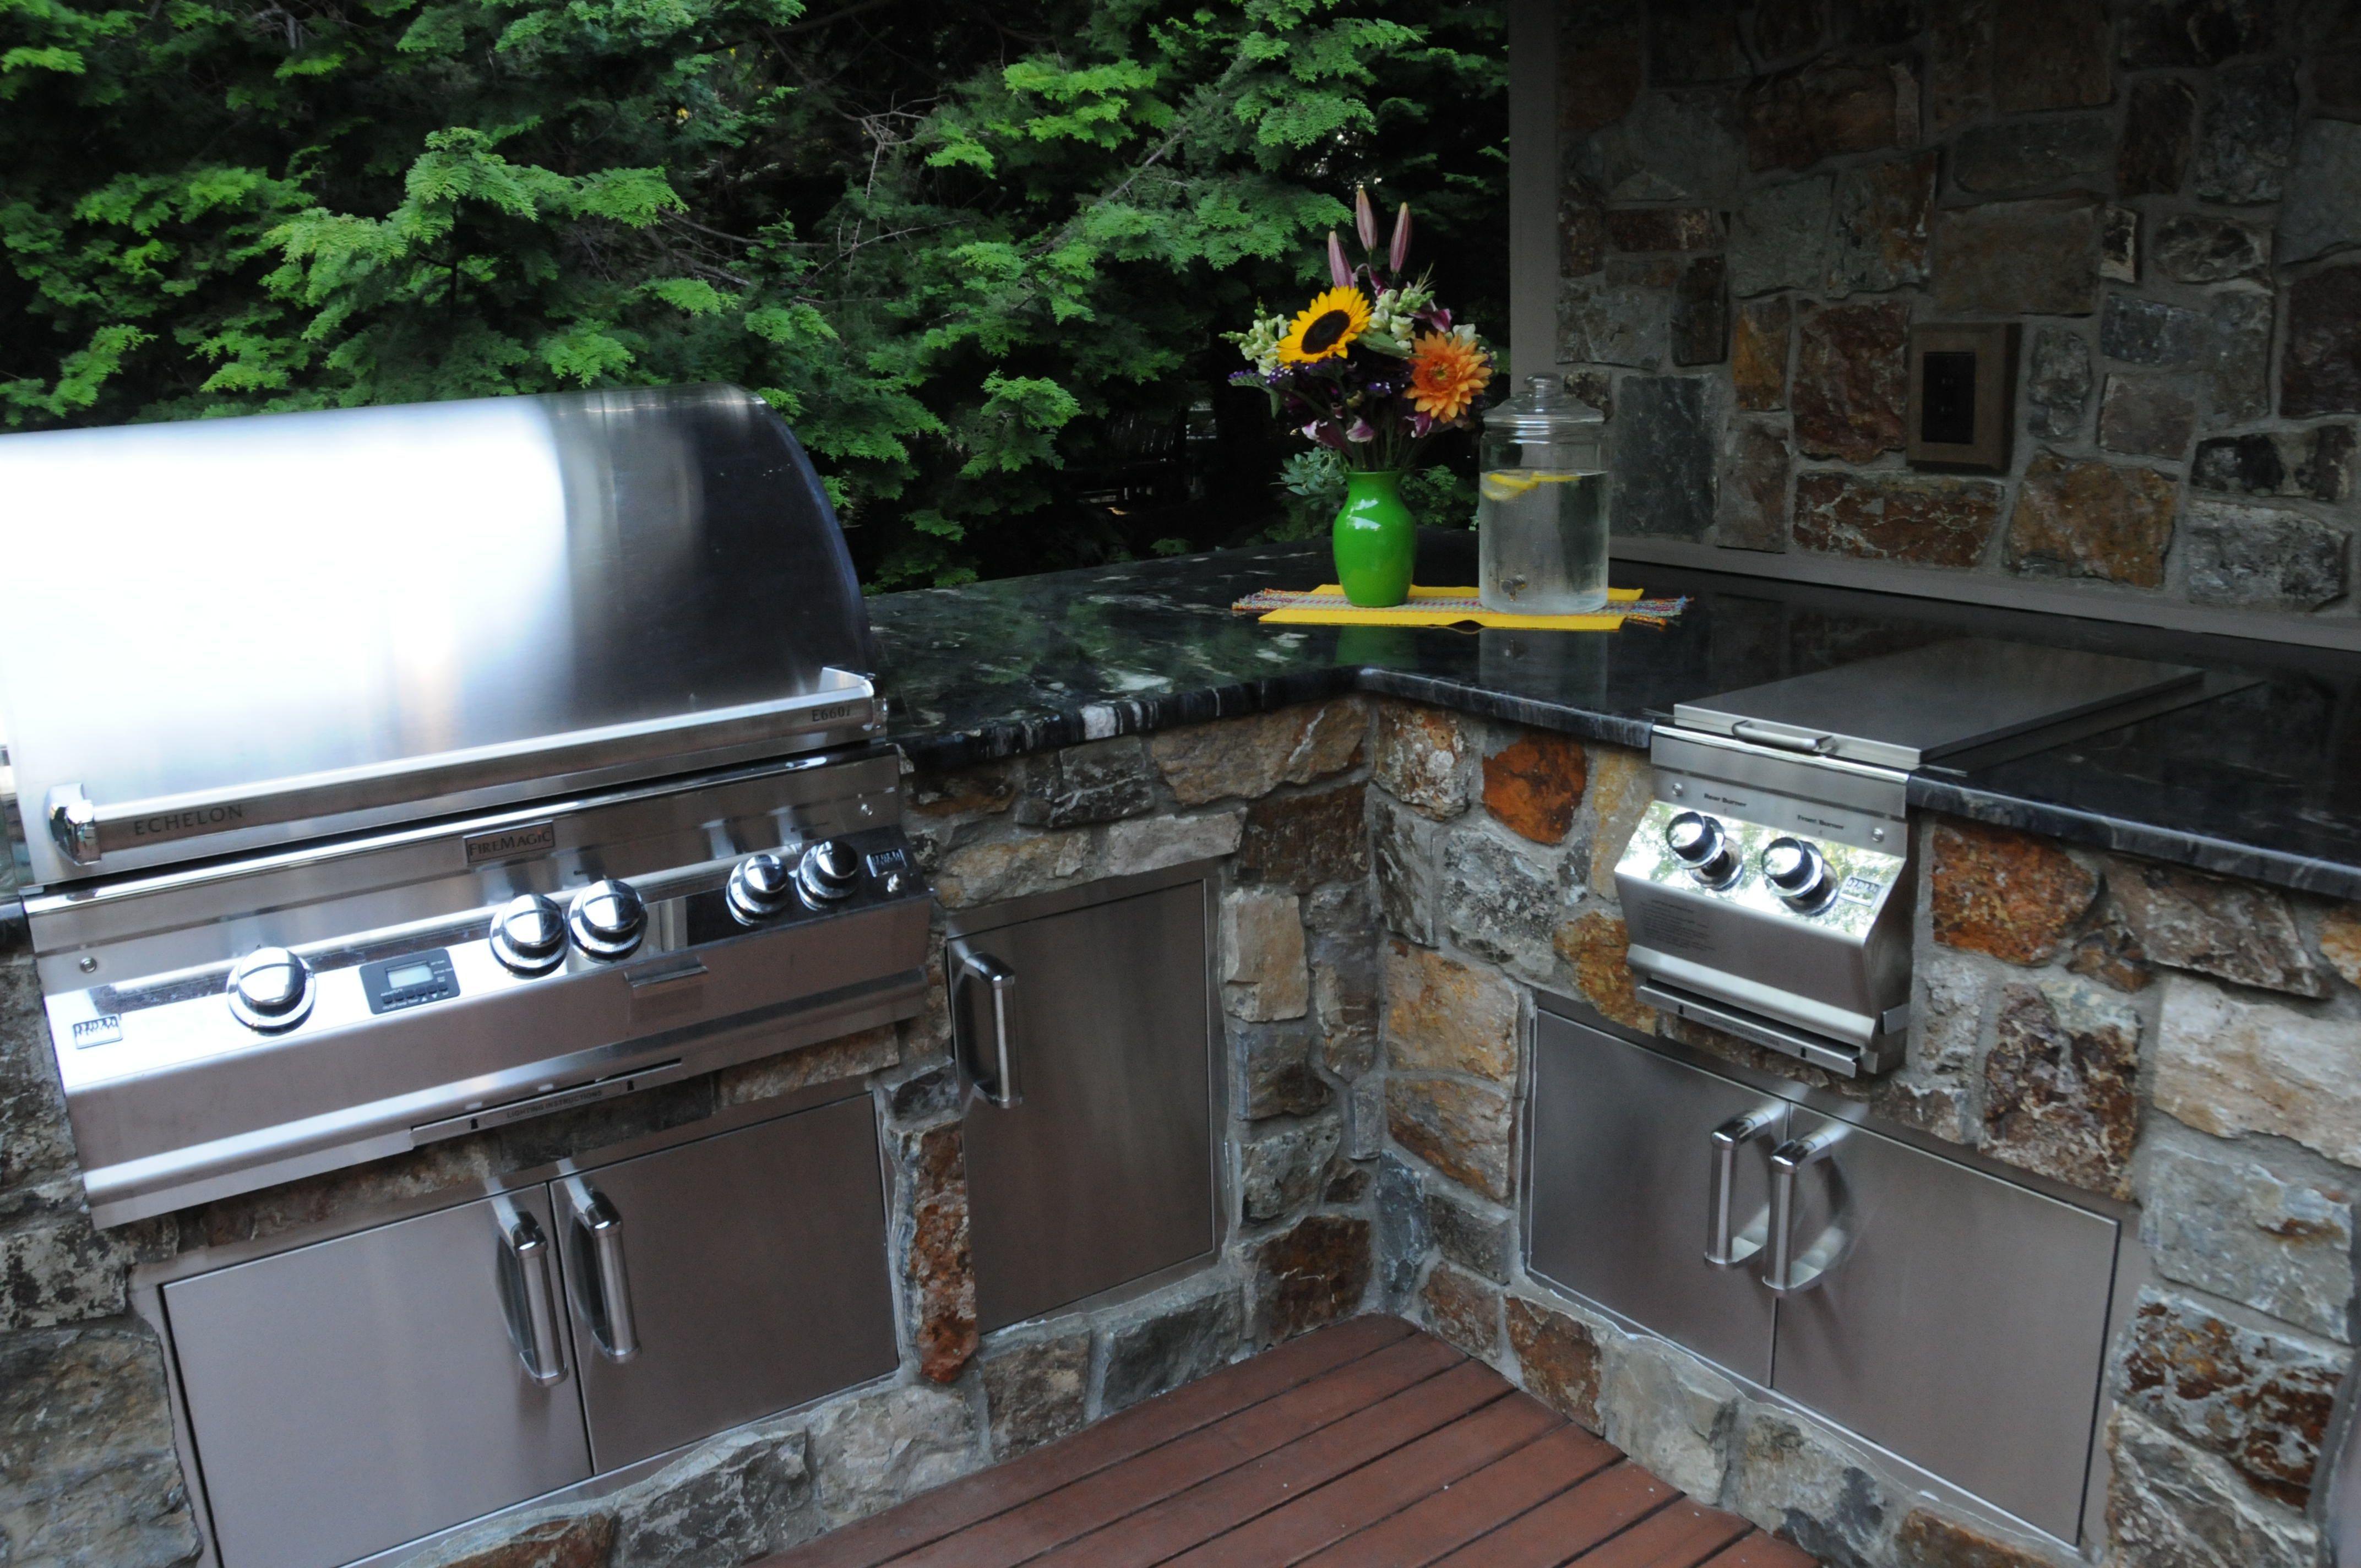 Graysen woods outdoor kitchen island ideas for the backyard